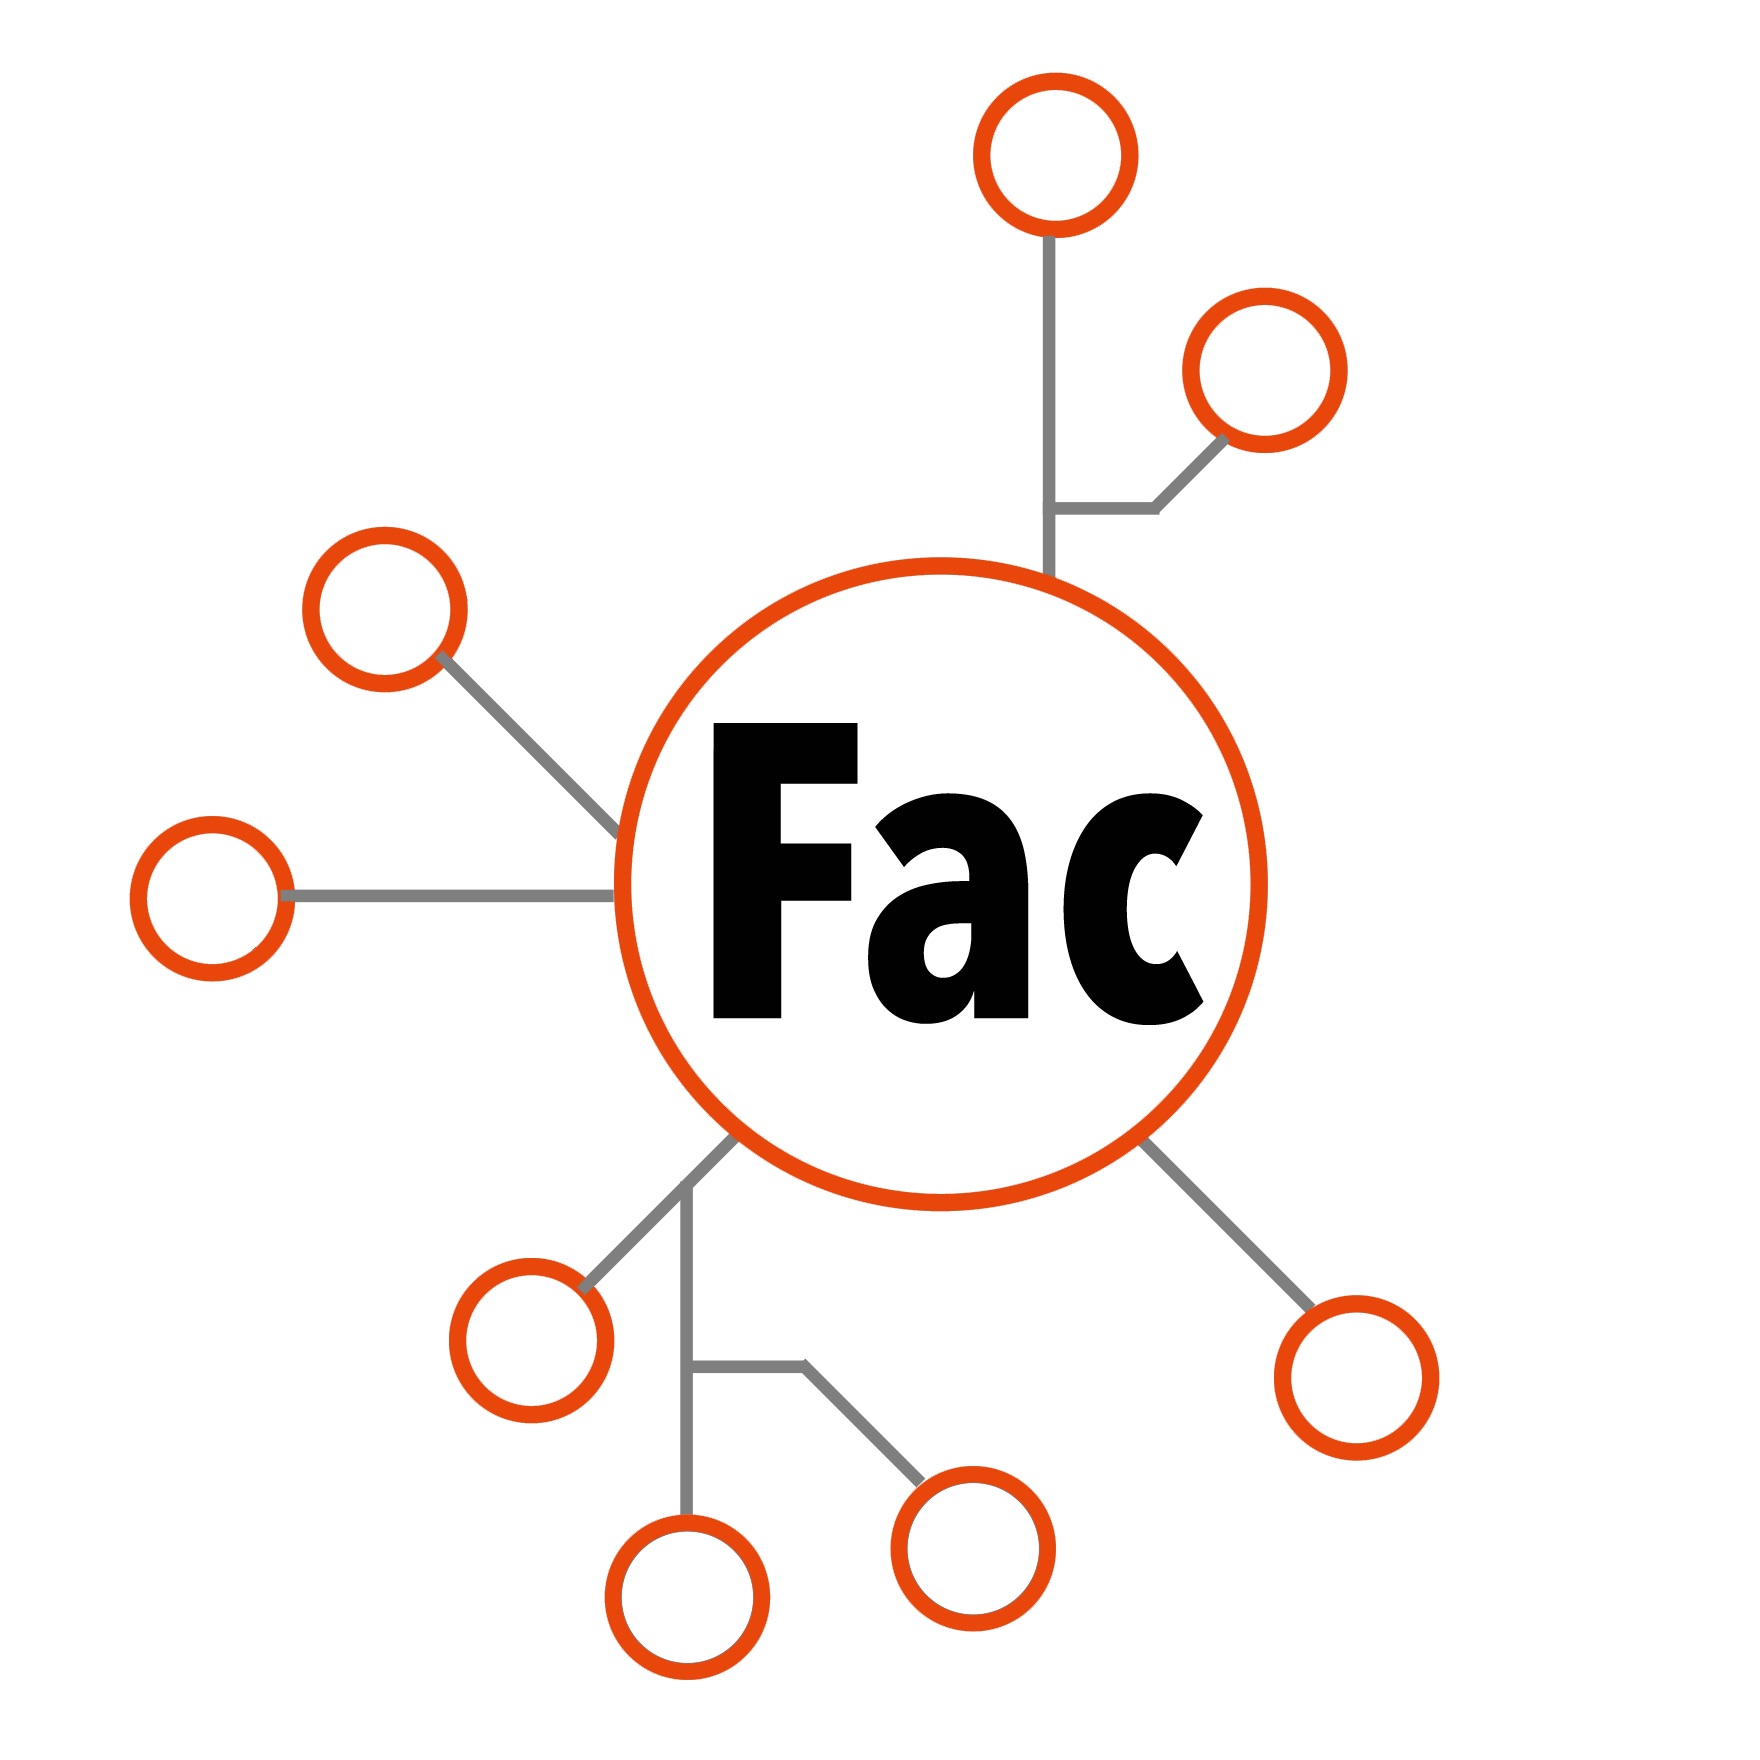 Aliem faculty incubator aliem faculty incubator michael gottlieb md rdms 2018 04 05t2359010000 1betcityfo Gallery